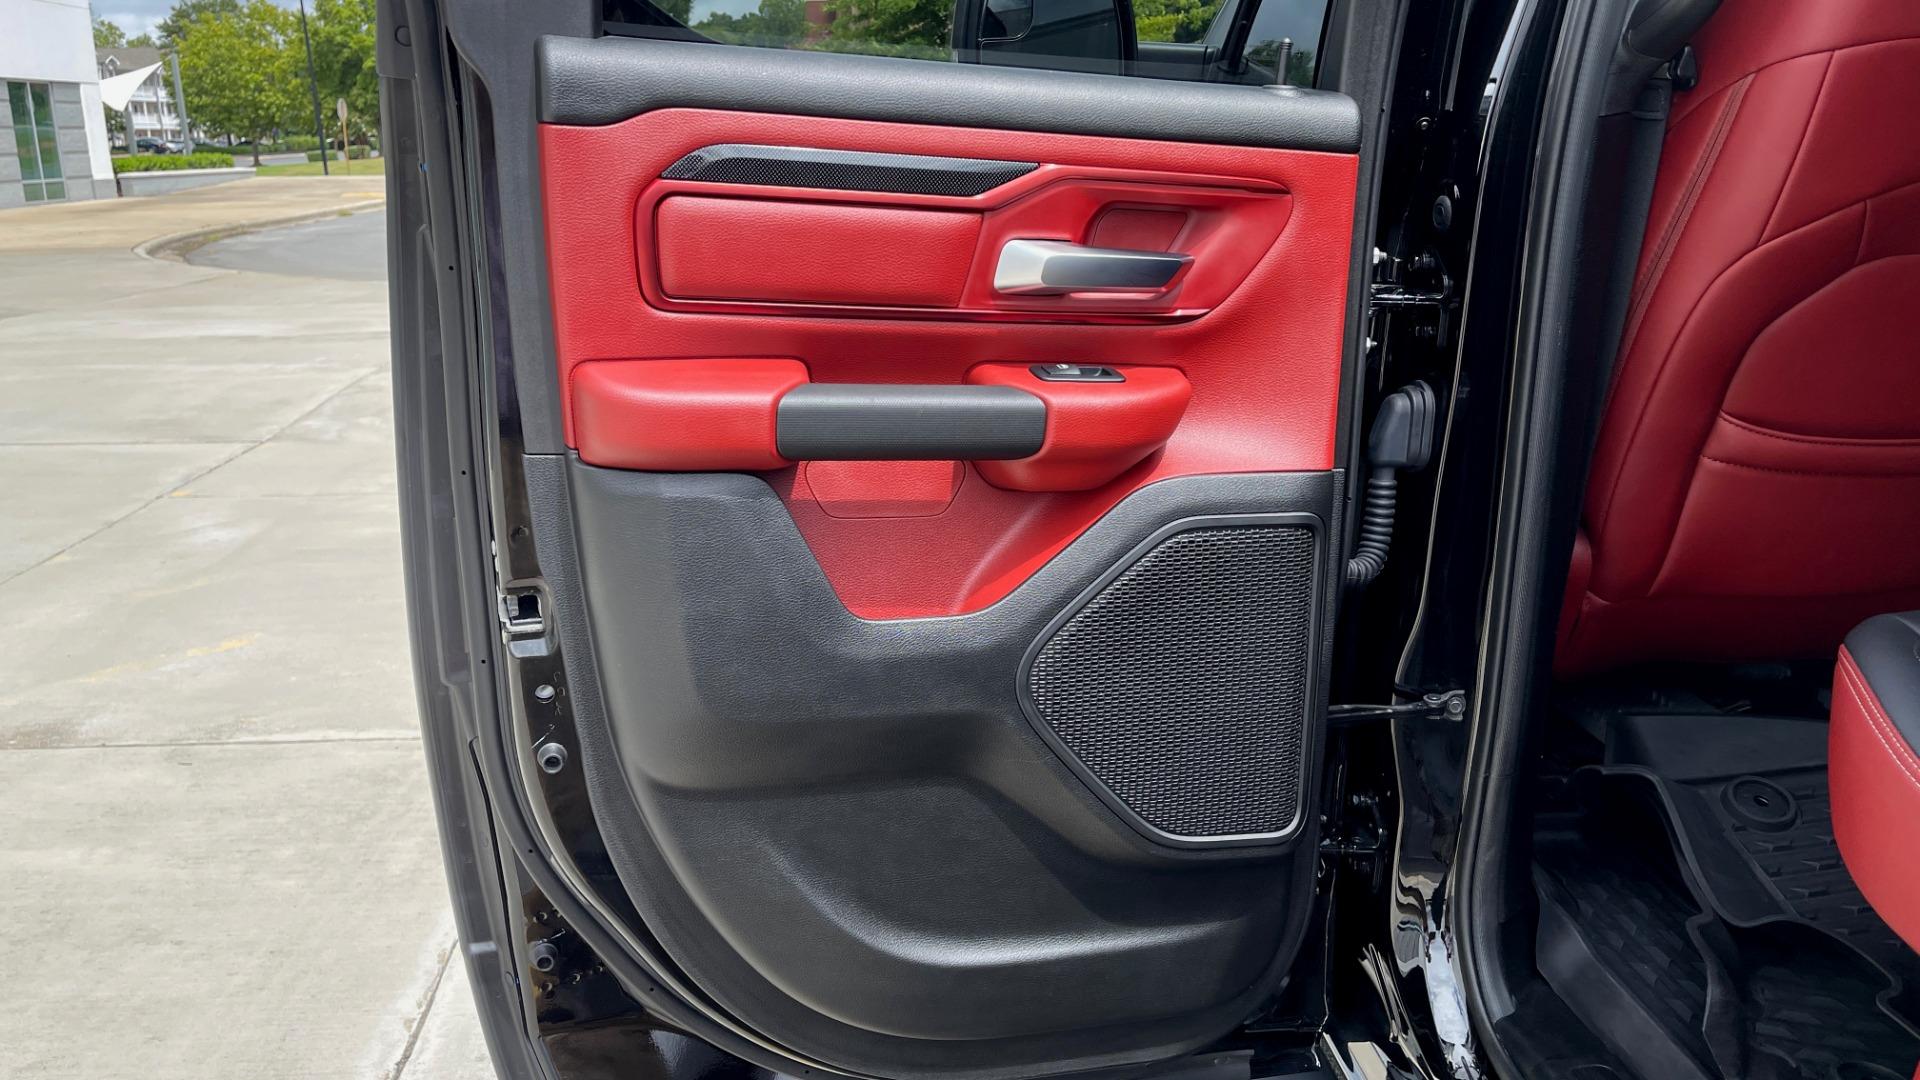 Used 2019 Ram 1500 REBEL QUADCAB 4X4 / 5.7L HEMI / 8-SPD AUTO / REMOTE START / PARK ASSIST for sale $44,495 at Formula Imports in Charlotte NC 28227 51